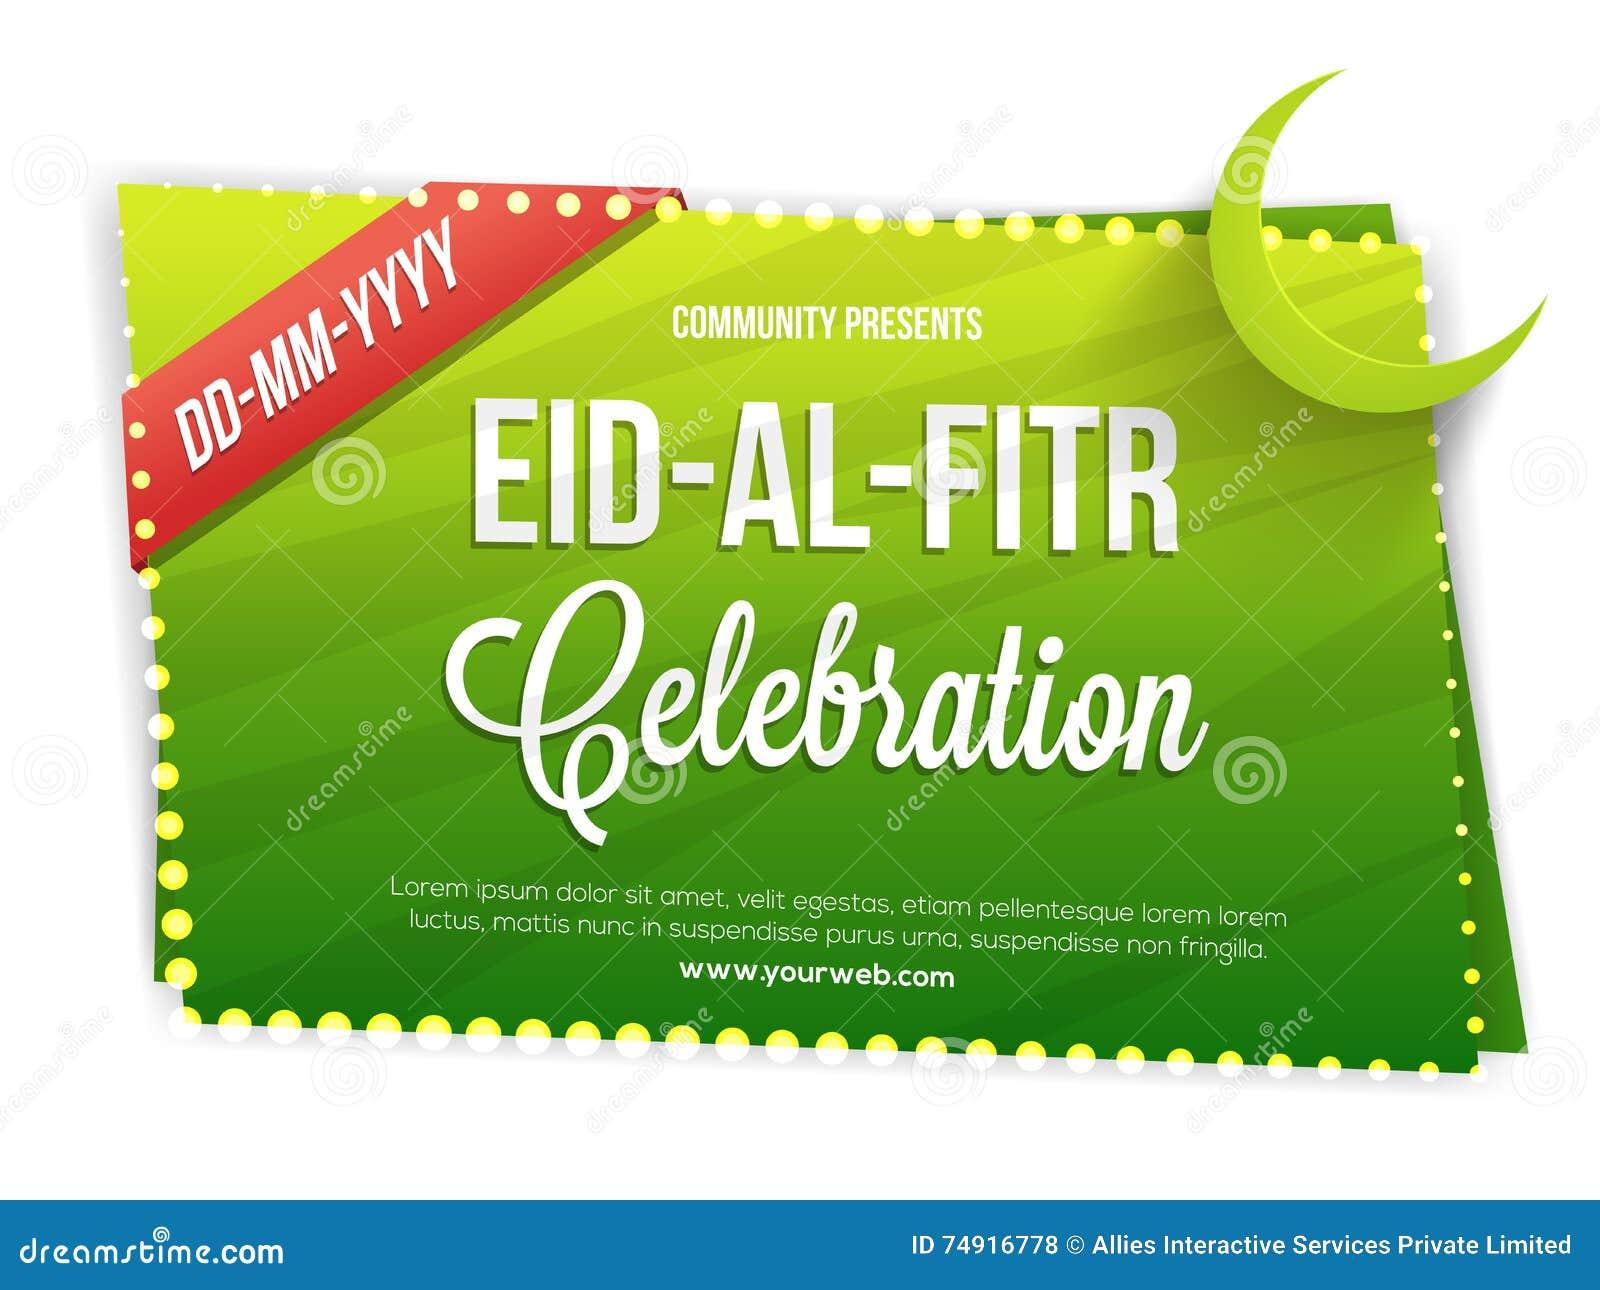 Invitation Card For Eid Al Fitr Celebration Stock Illustration